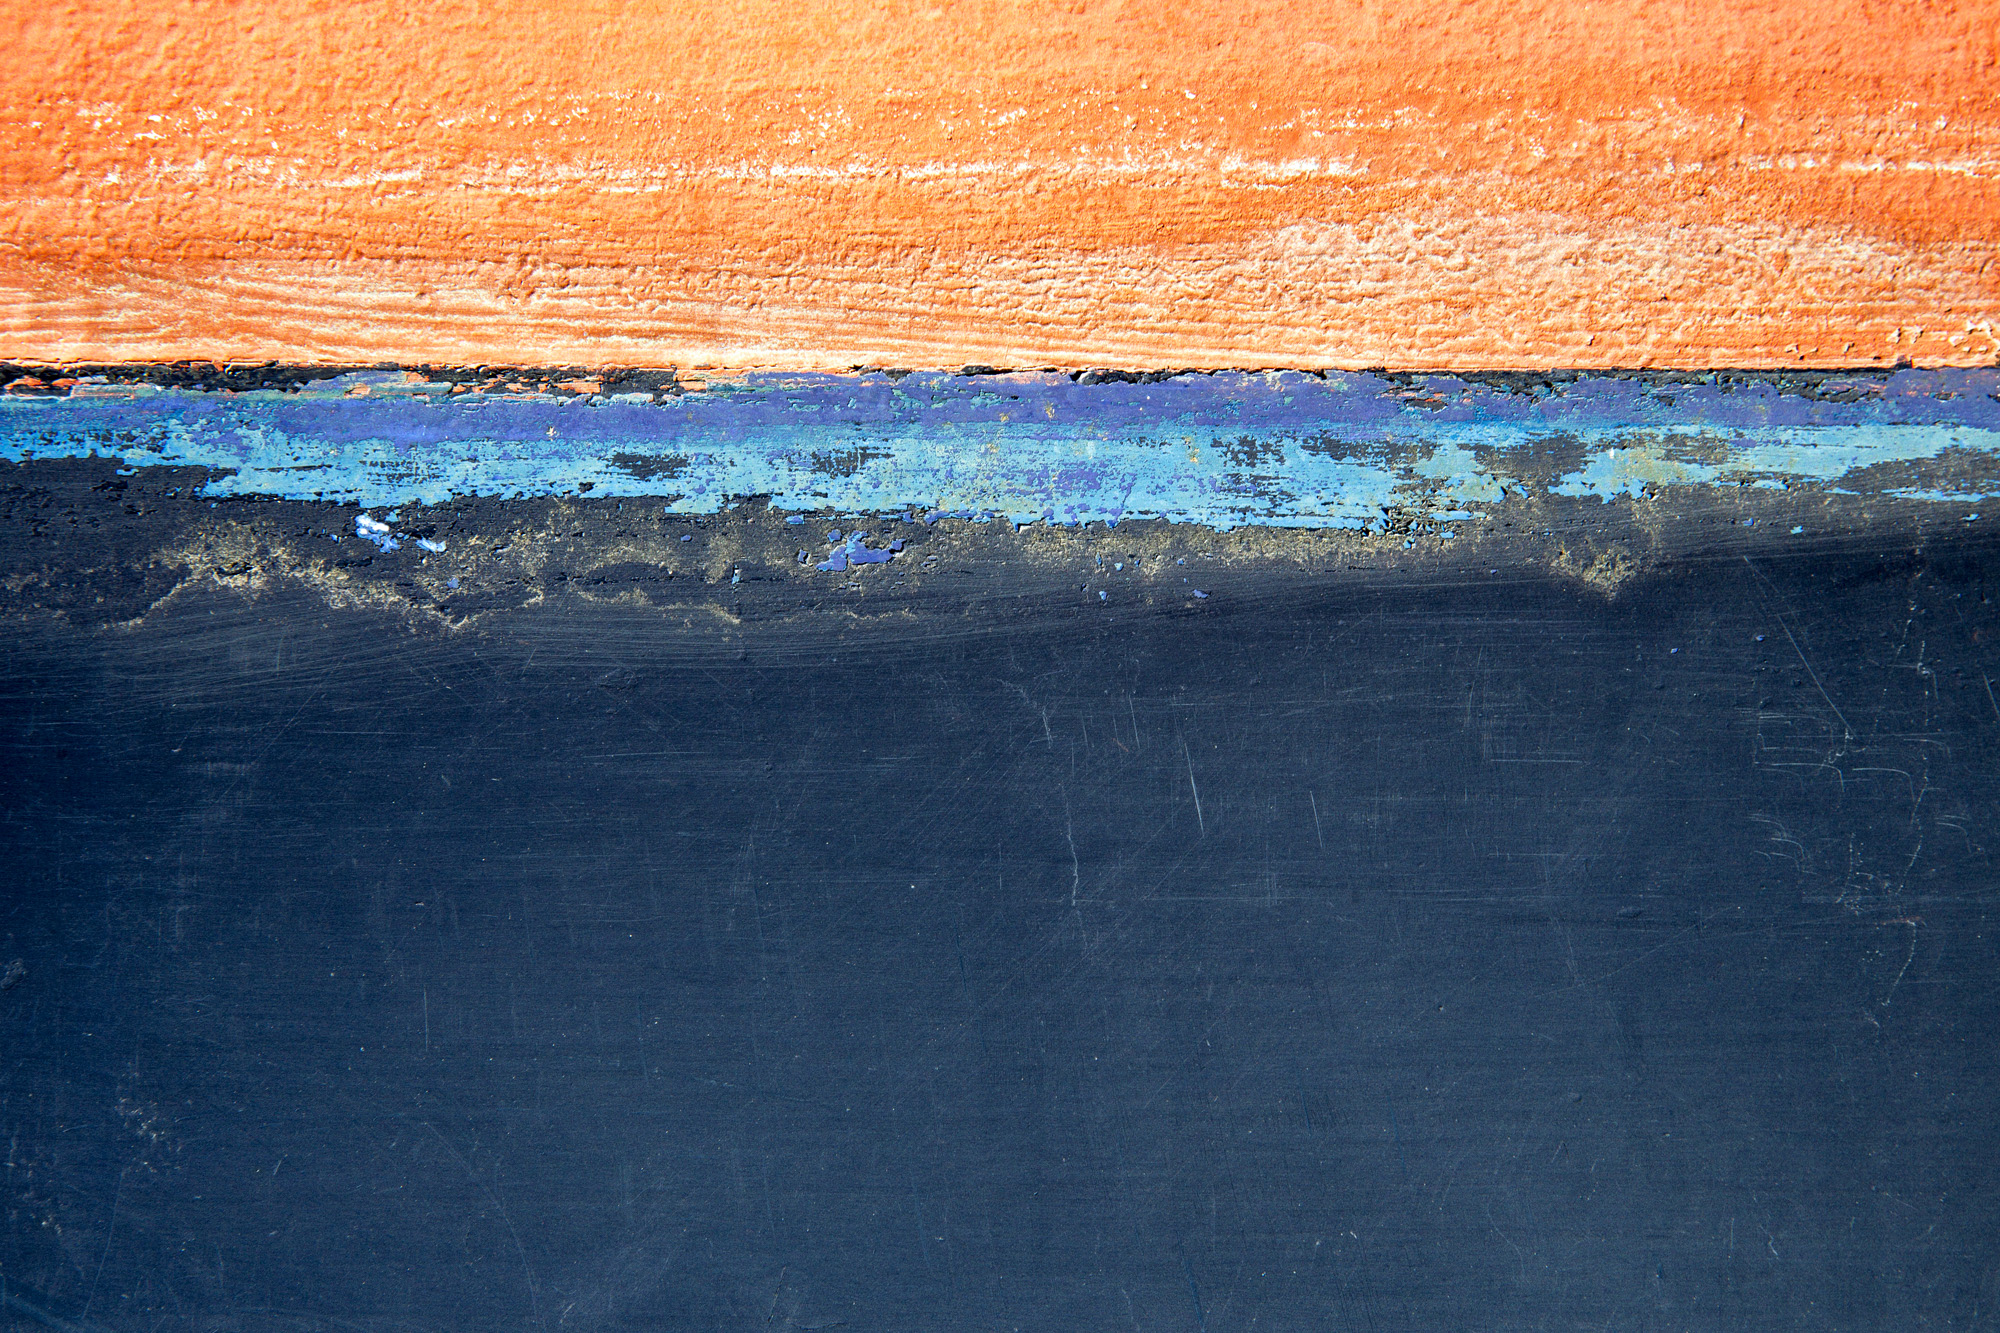 Dry Documentaries: Hamptons Sunrise, 2018, archival pigment print, 12 x 18 in, edition of 10, $700